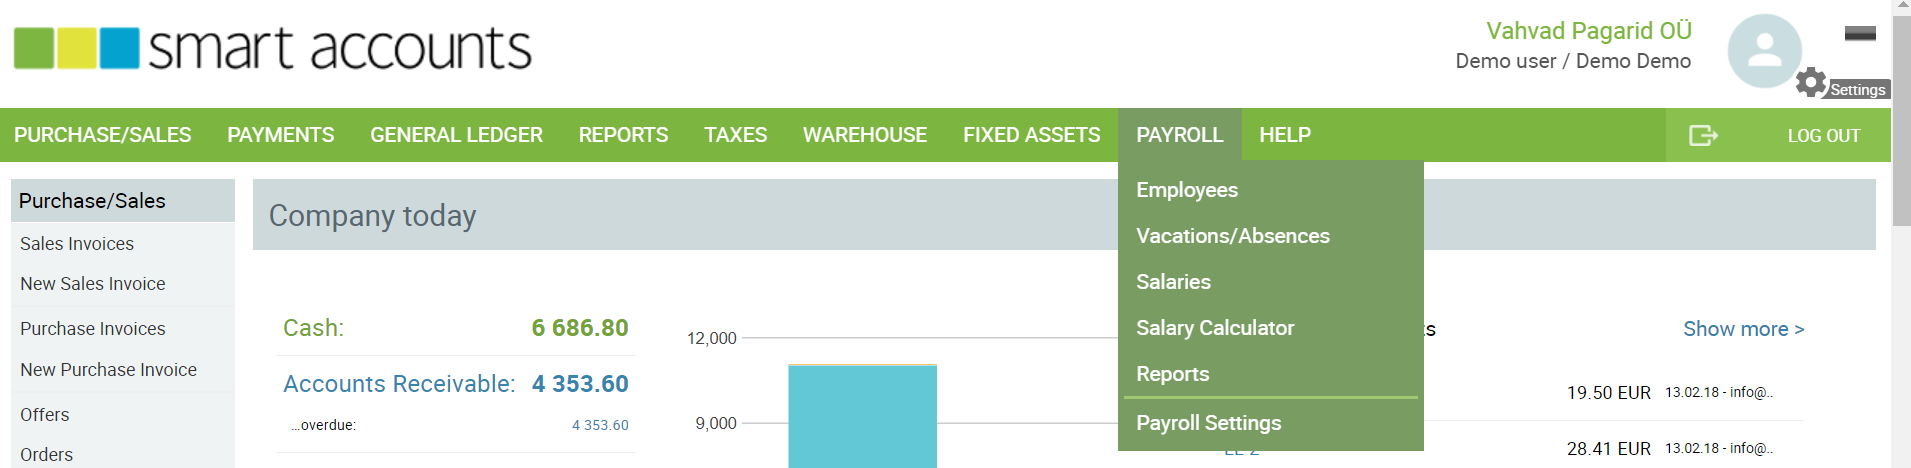 payroll menu